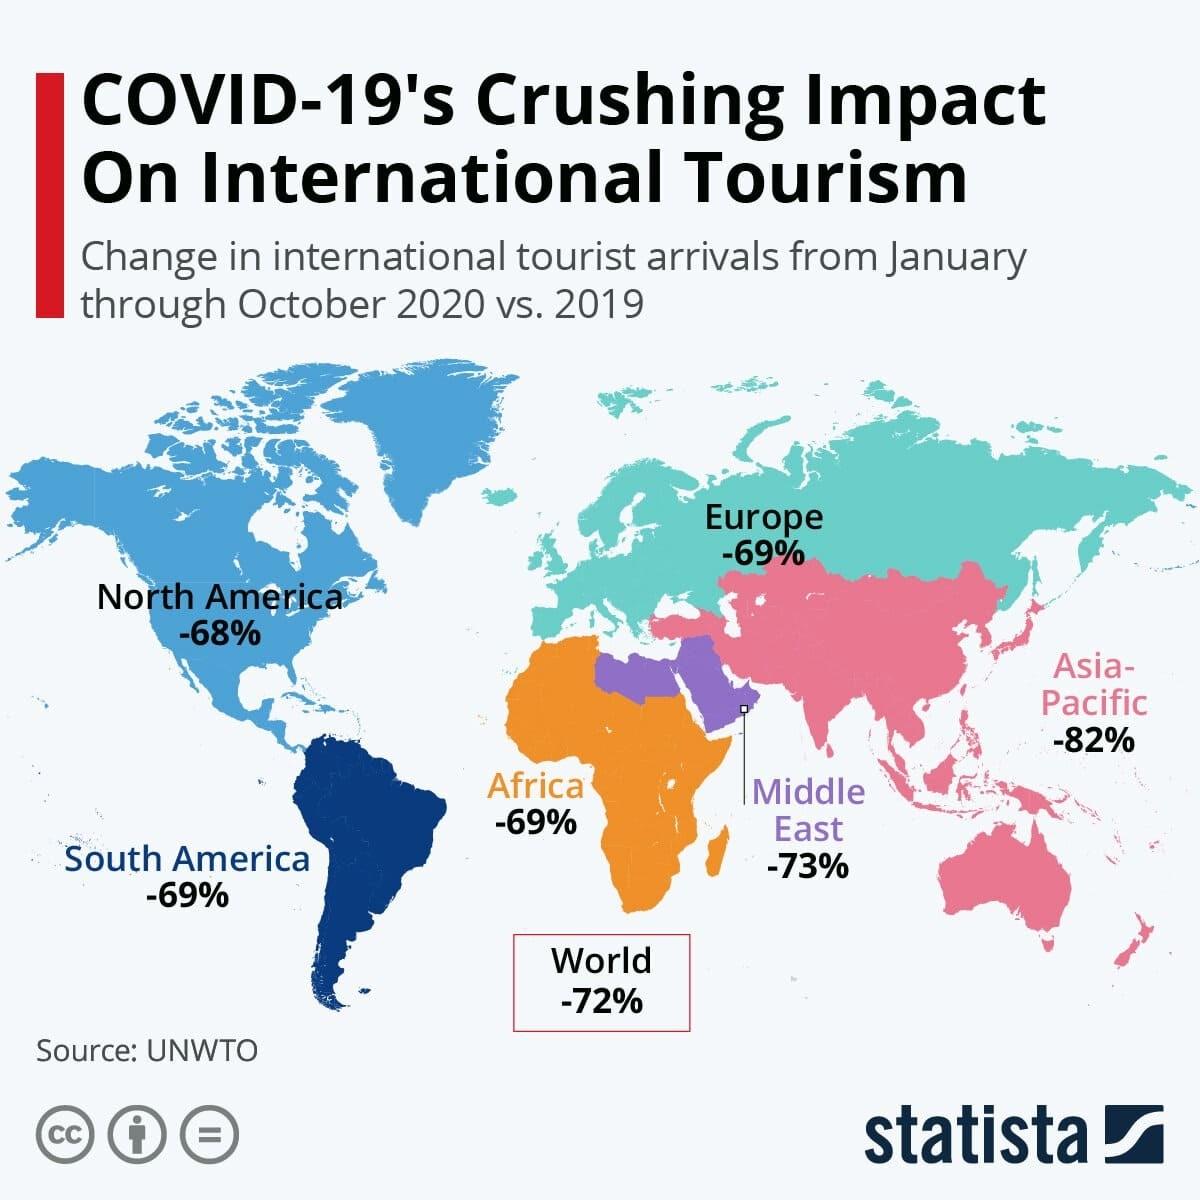 COVID-19's Crushing Impact On International Tourism